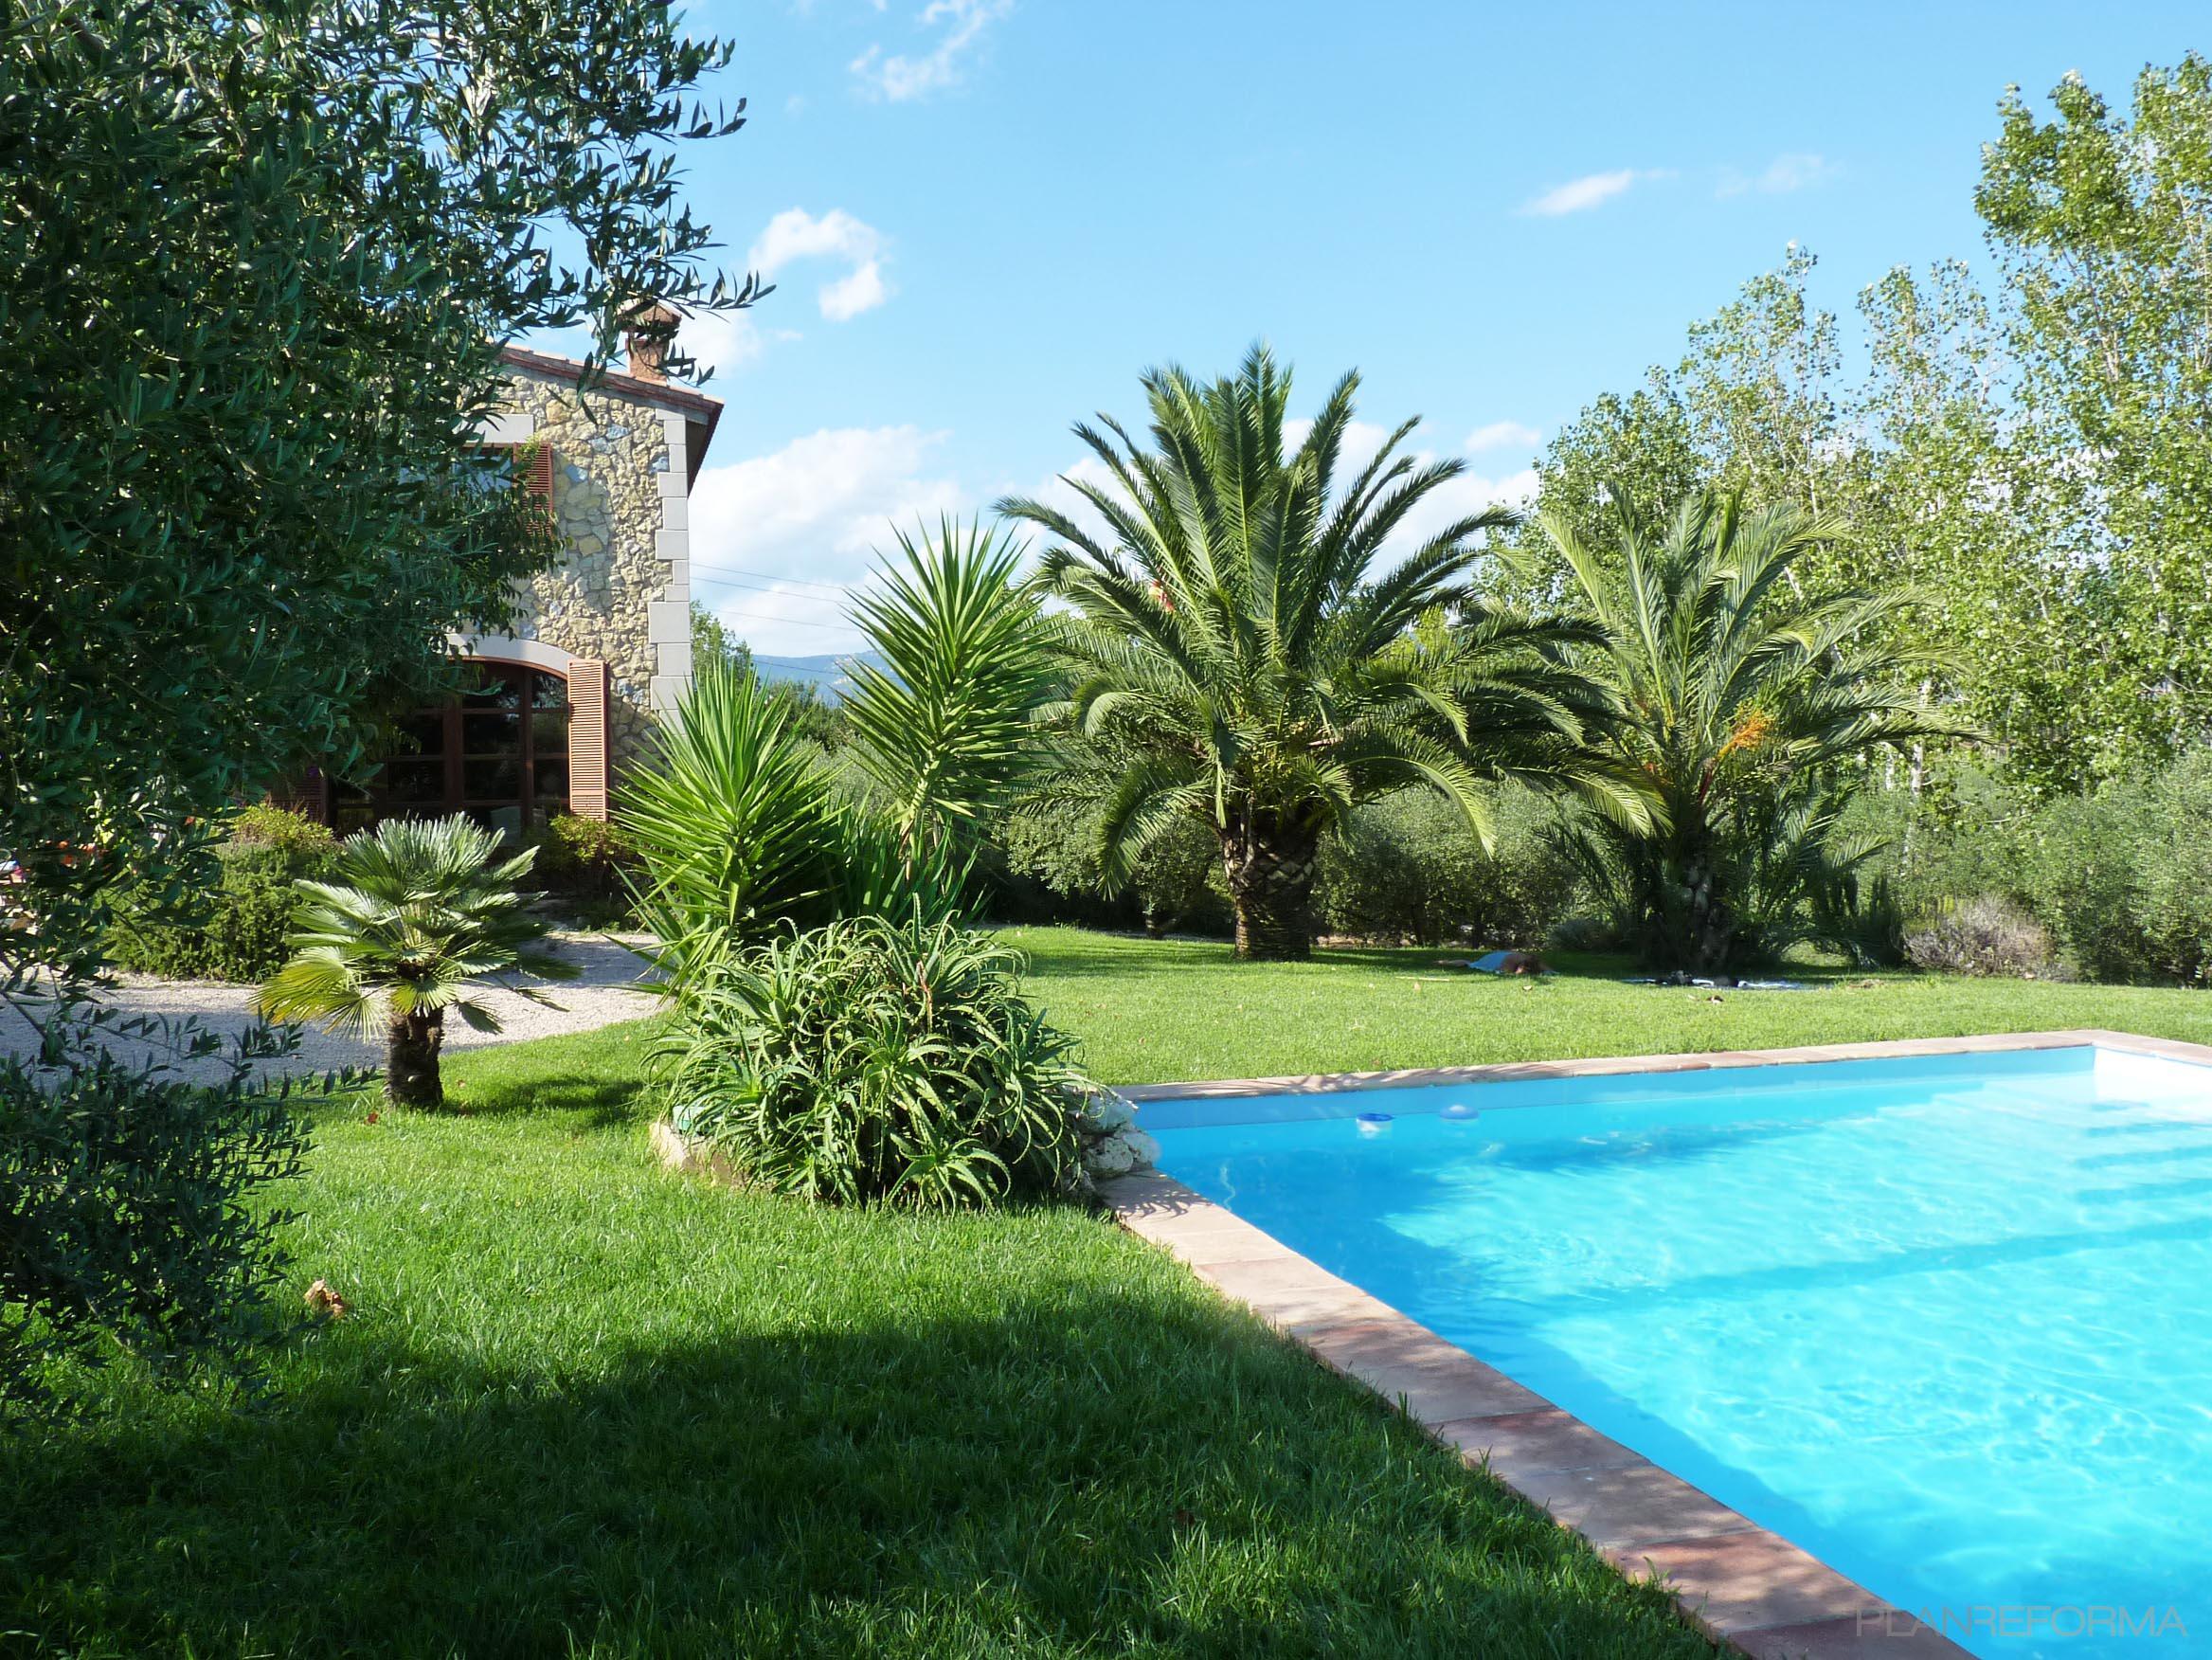 Piscina exterior jardin estilo mediterraneo color verde for Piscinas de jardin